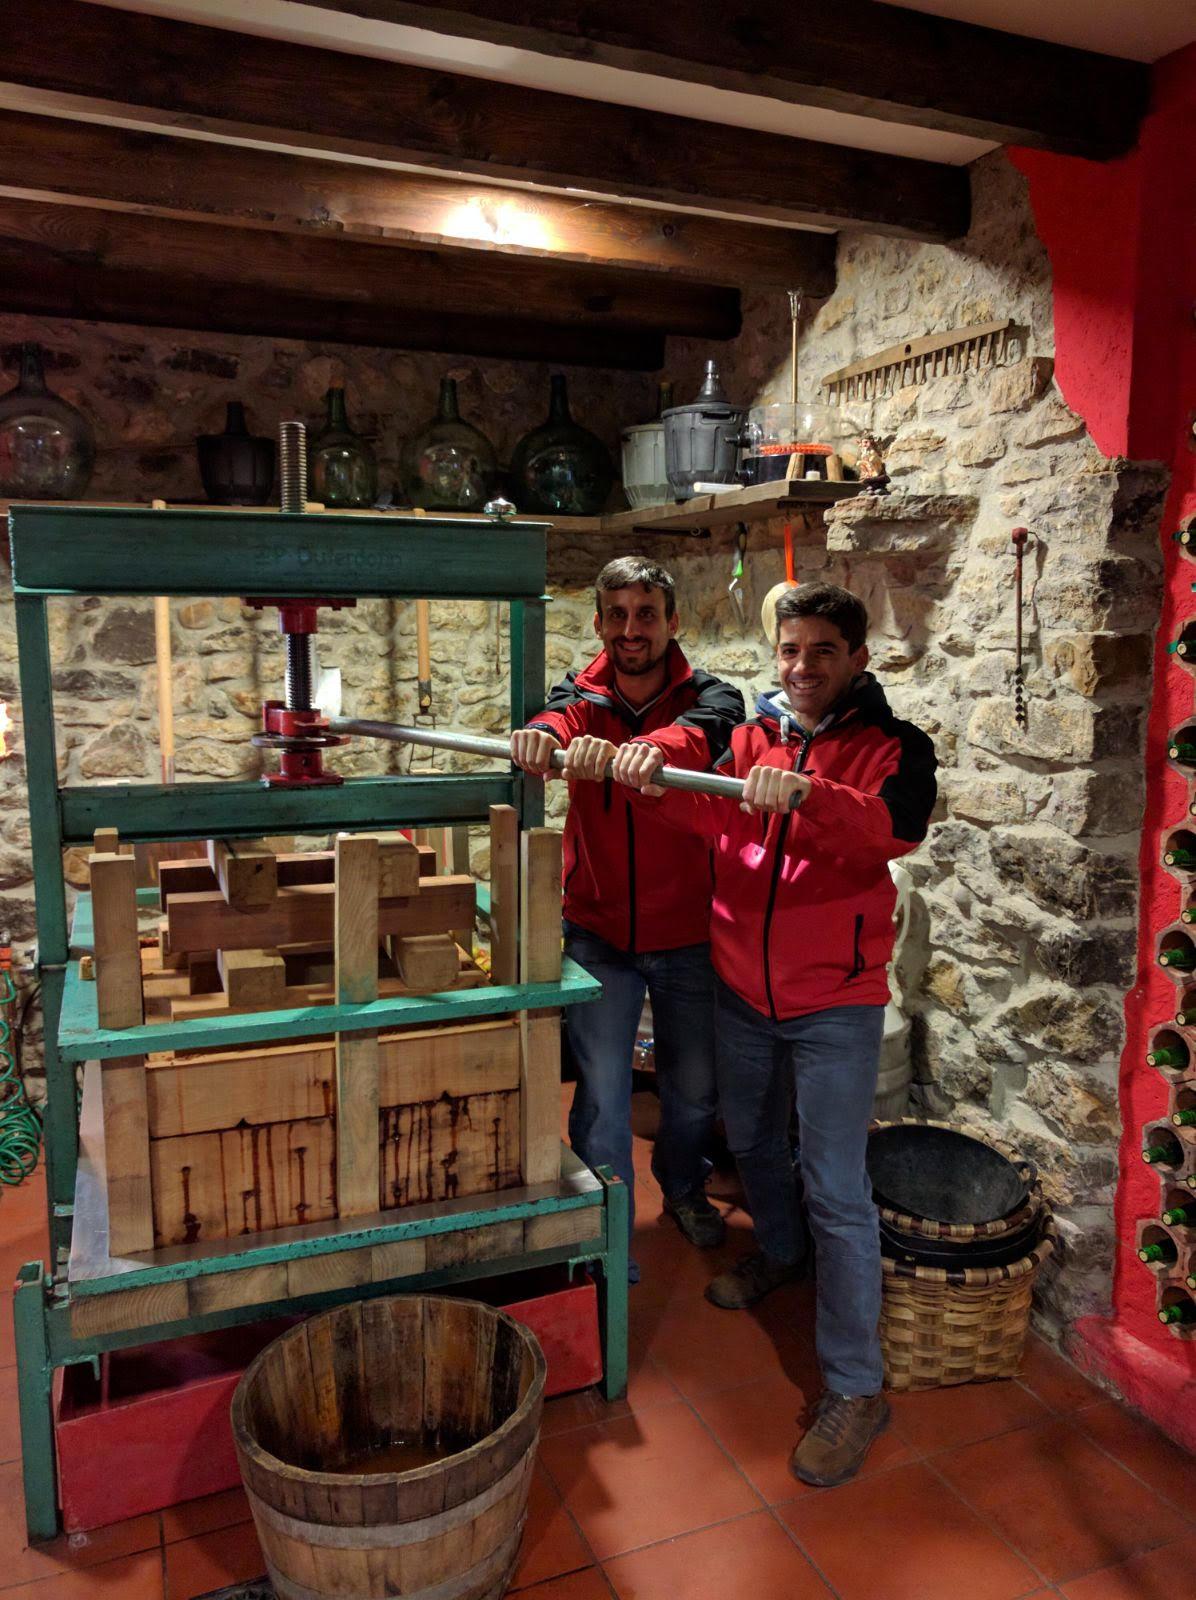 Integrantes del club Deportivo Navarra en el Llagar de sidra de nuestra casa rural